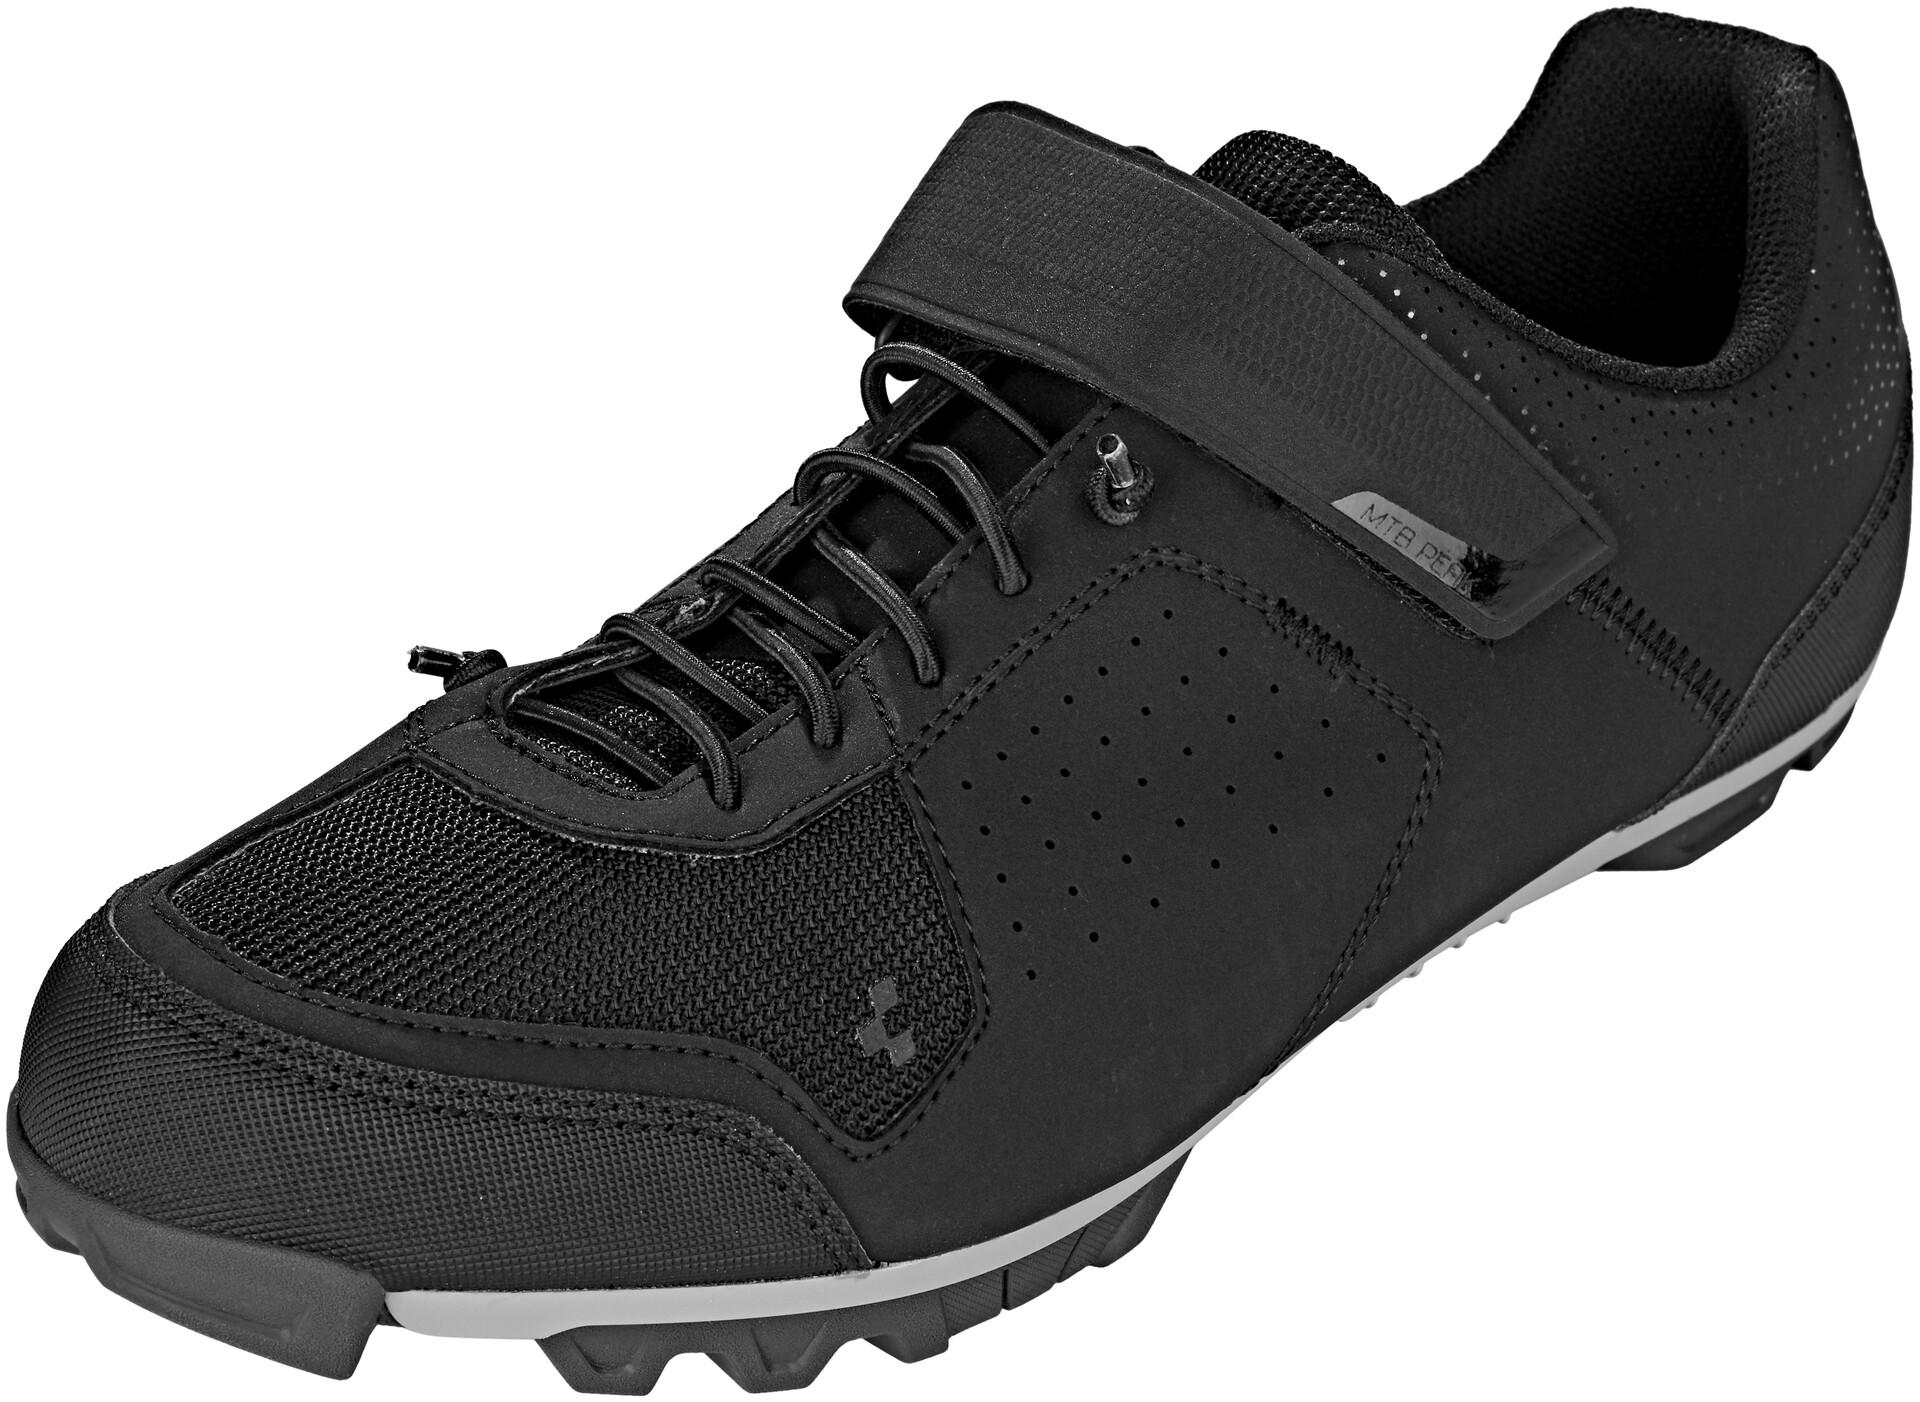 Cube Mtb Shoes Blackline Peak Unisex QrhdtxoCBs